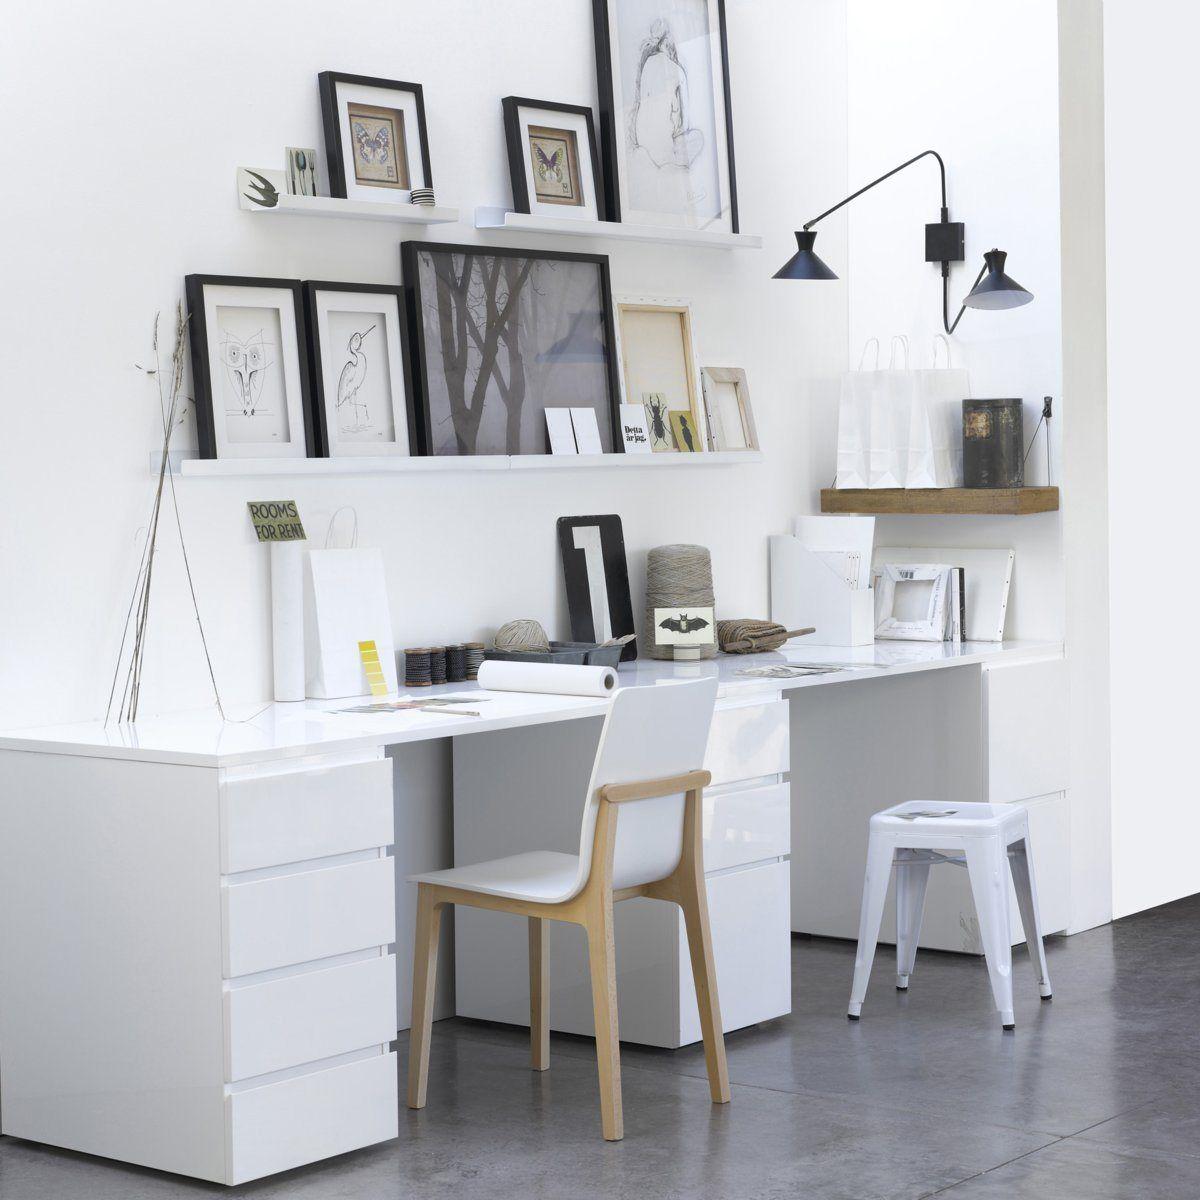 Bureau Noir Et Blanc chaise bureau design ikea - kumpalo.parkersydnorhistoric